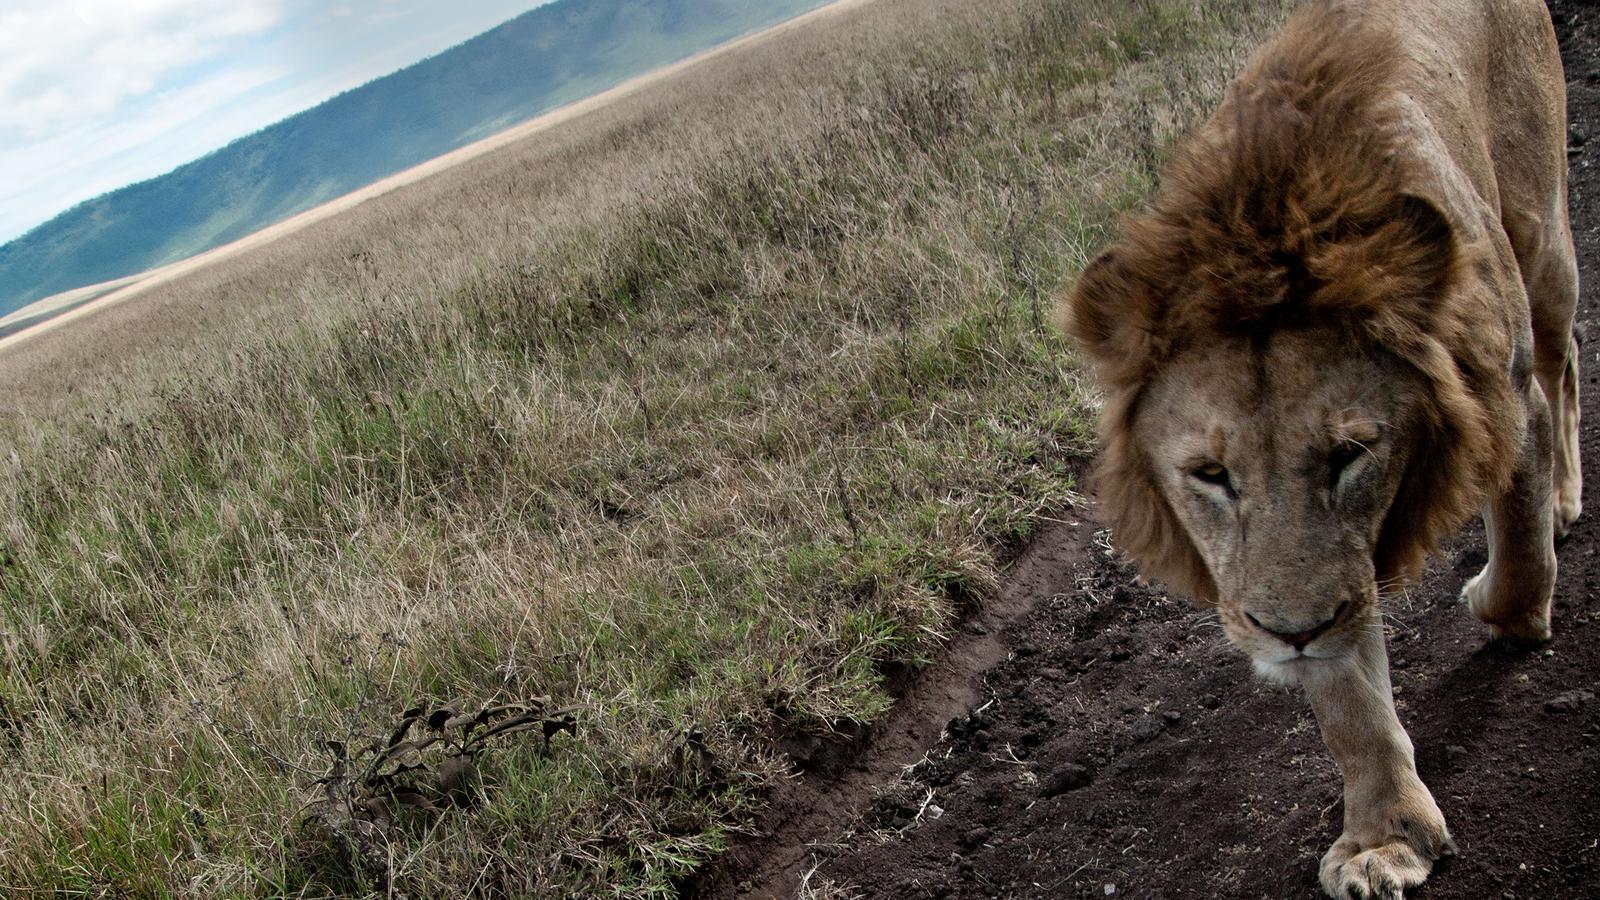 tanzania zanzibar adventure in tanzania africa g adventures